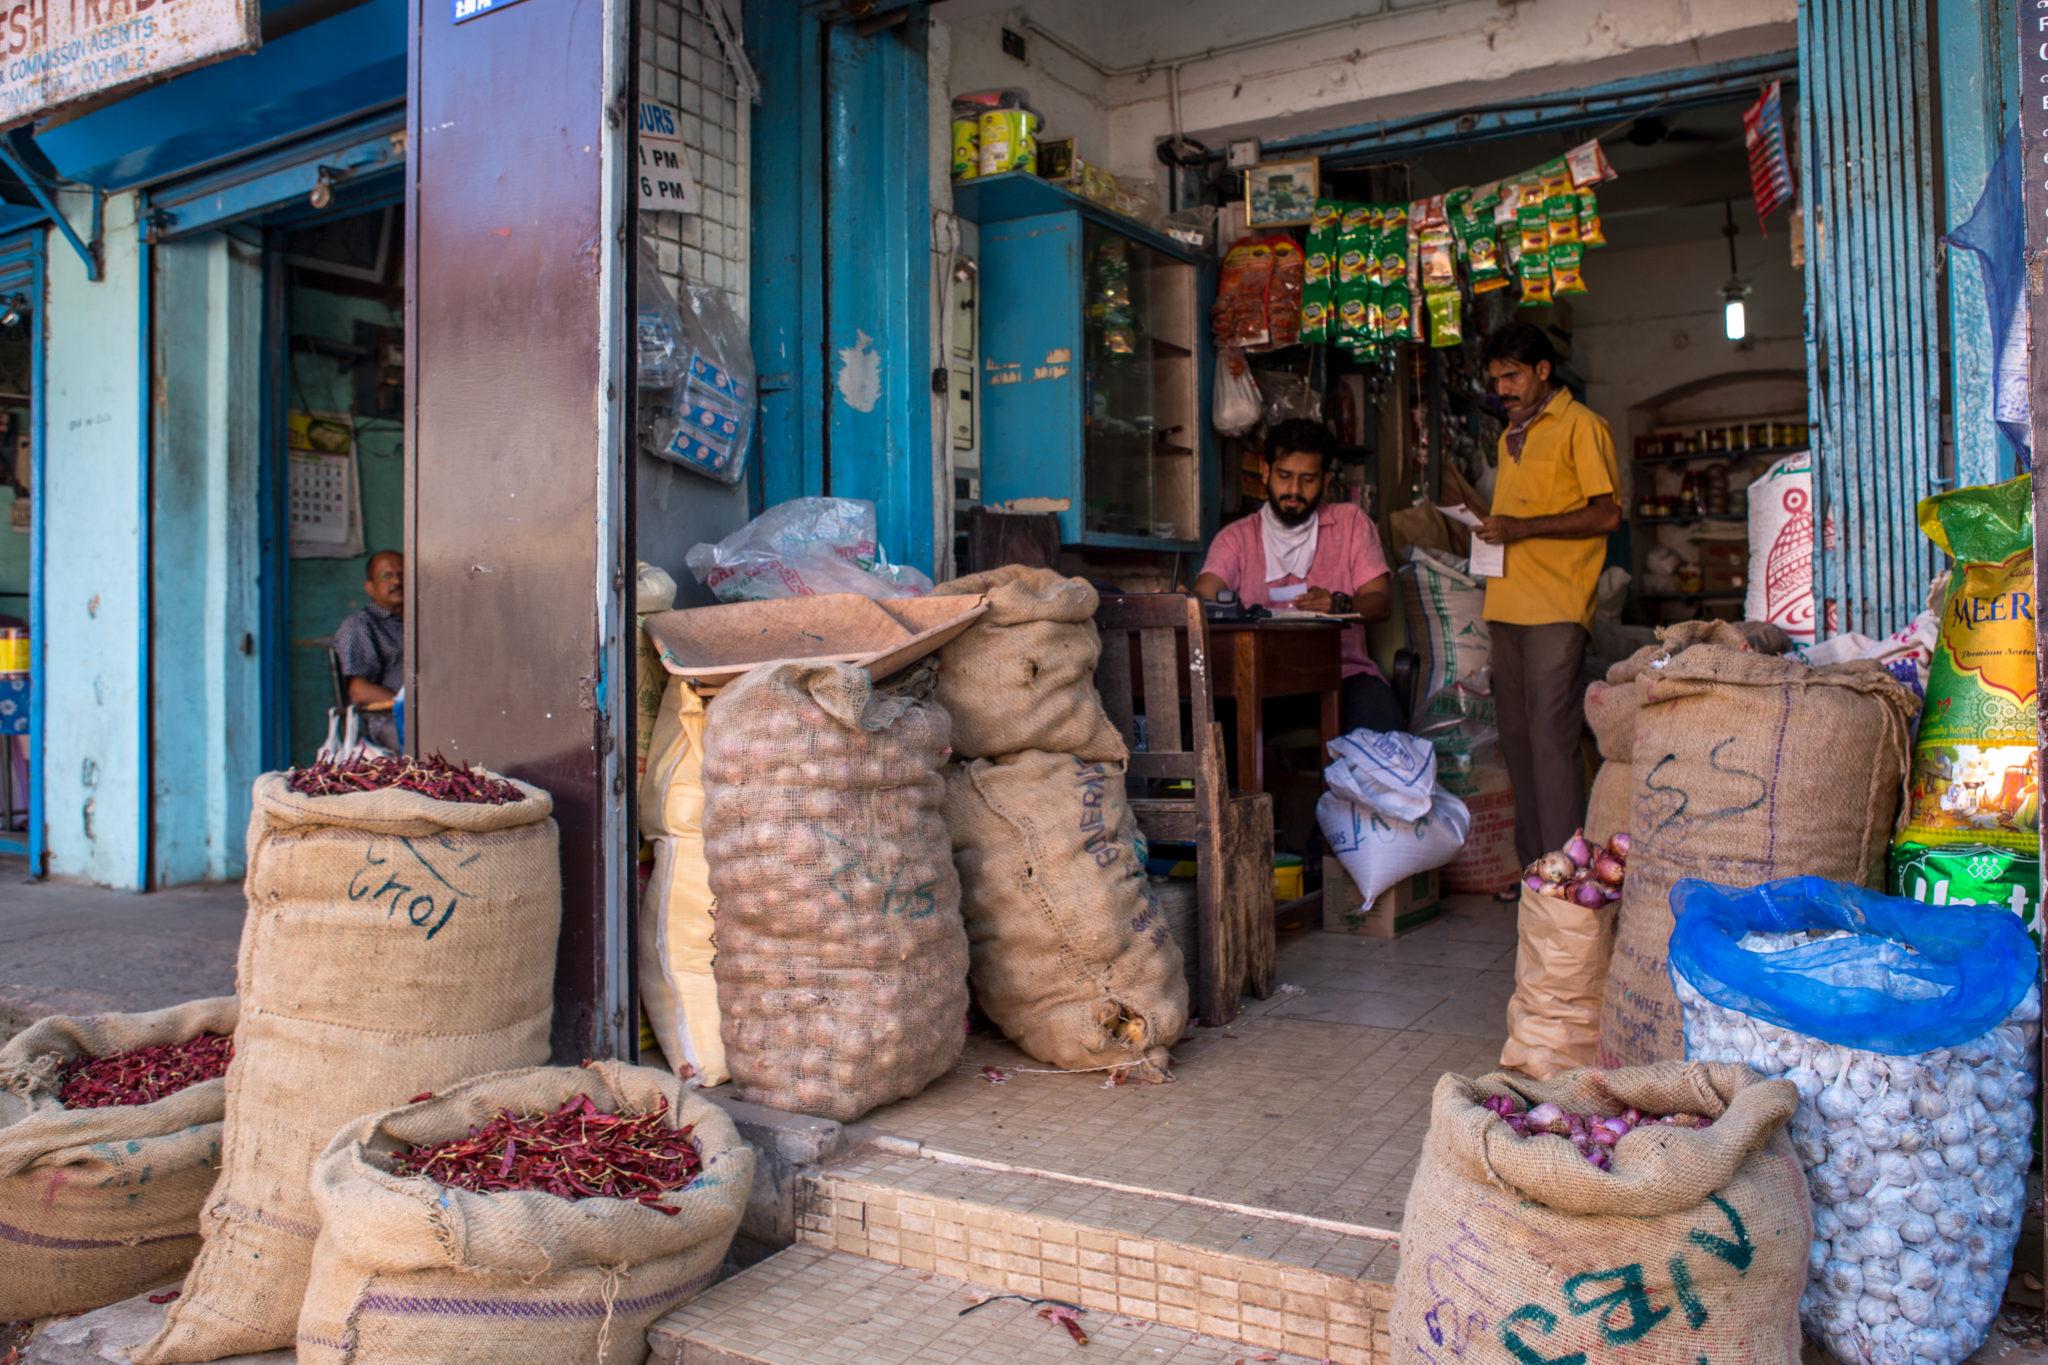 Kerala-épices-inde-voyage-visite